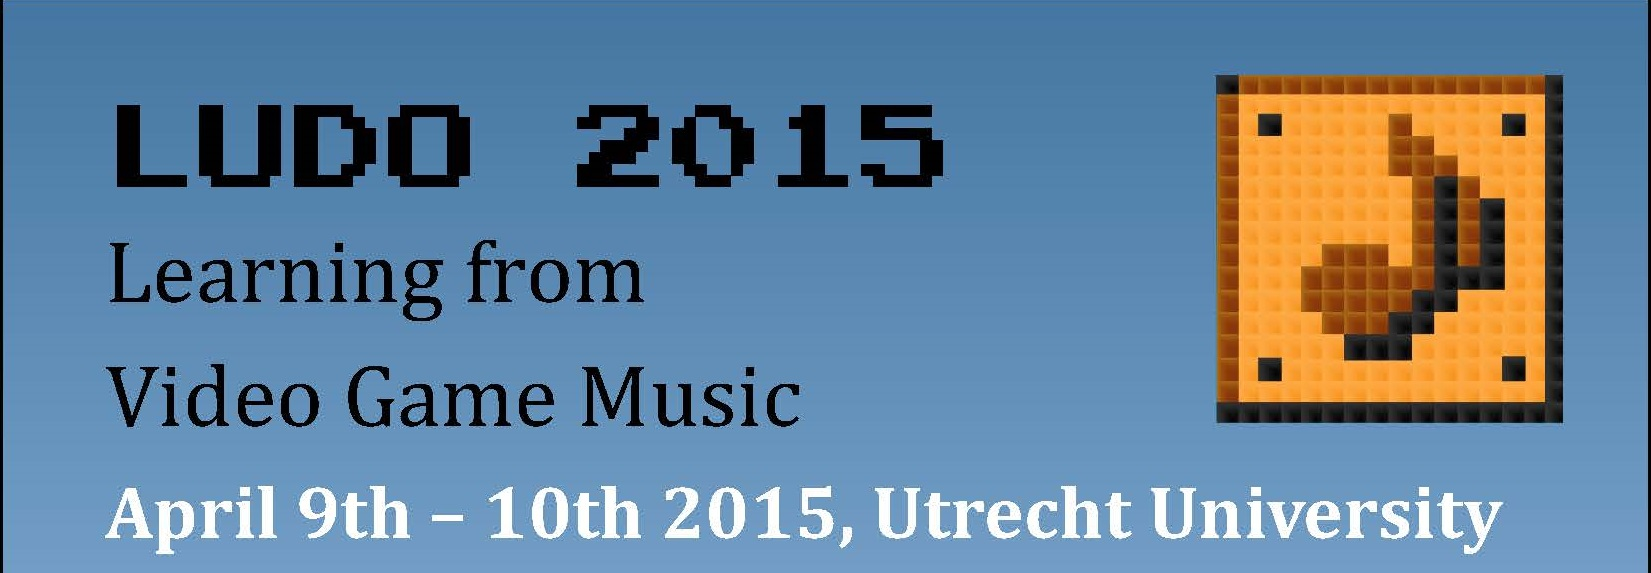 Ludo 2015 poster header